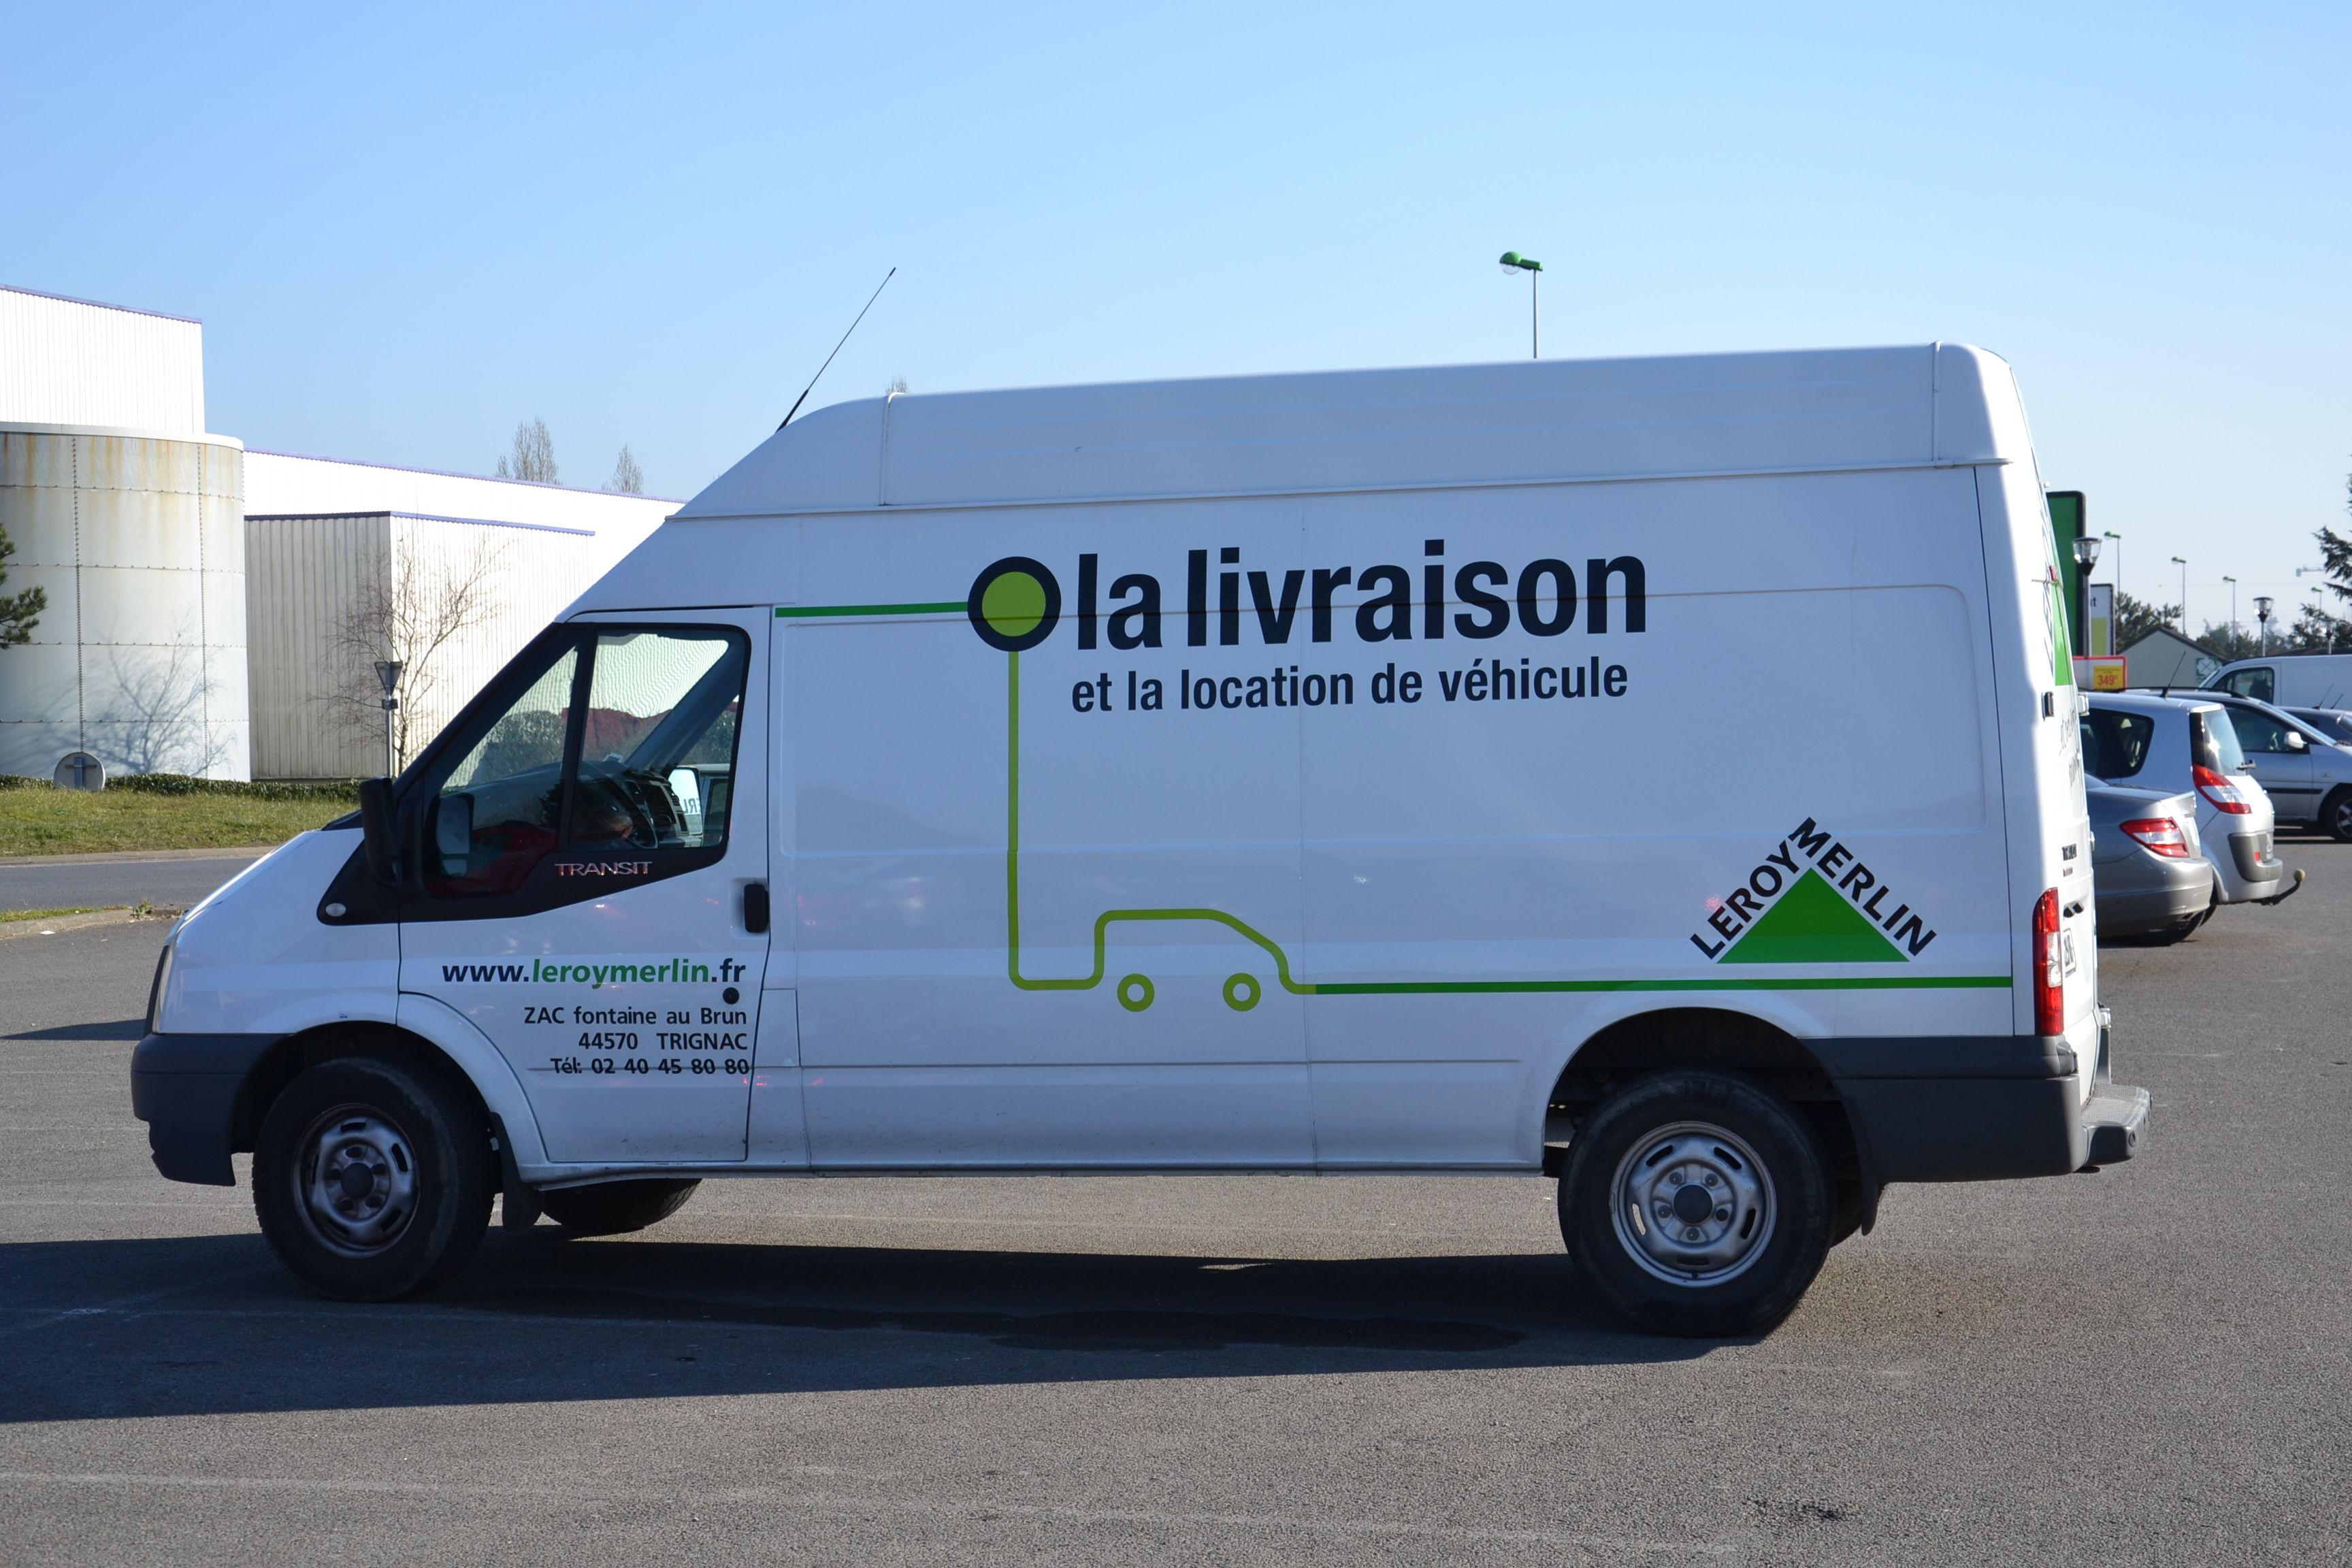 Service Livraison Camion Equipe Magasin Leroymerlintrignac